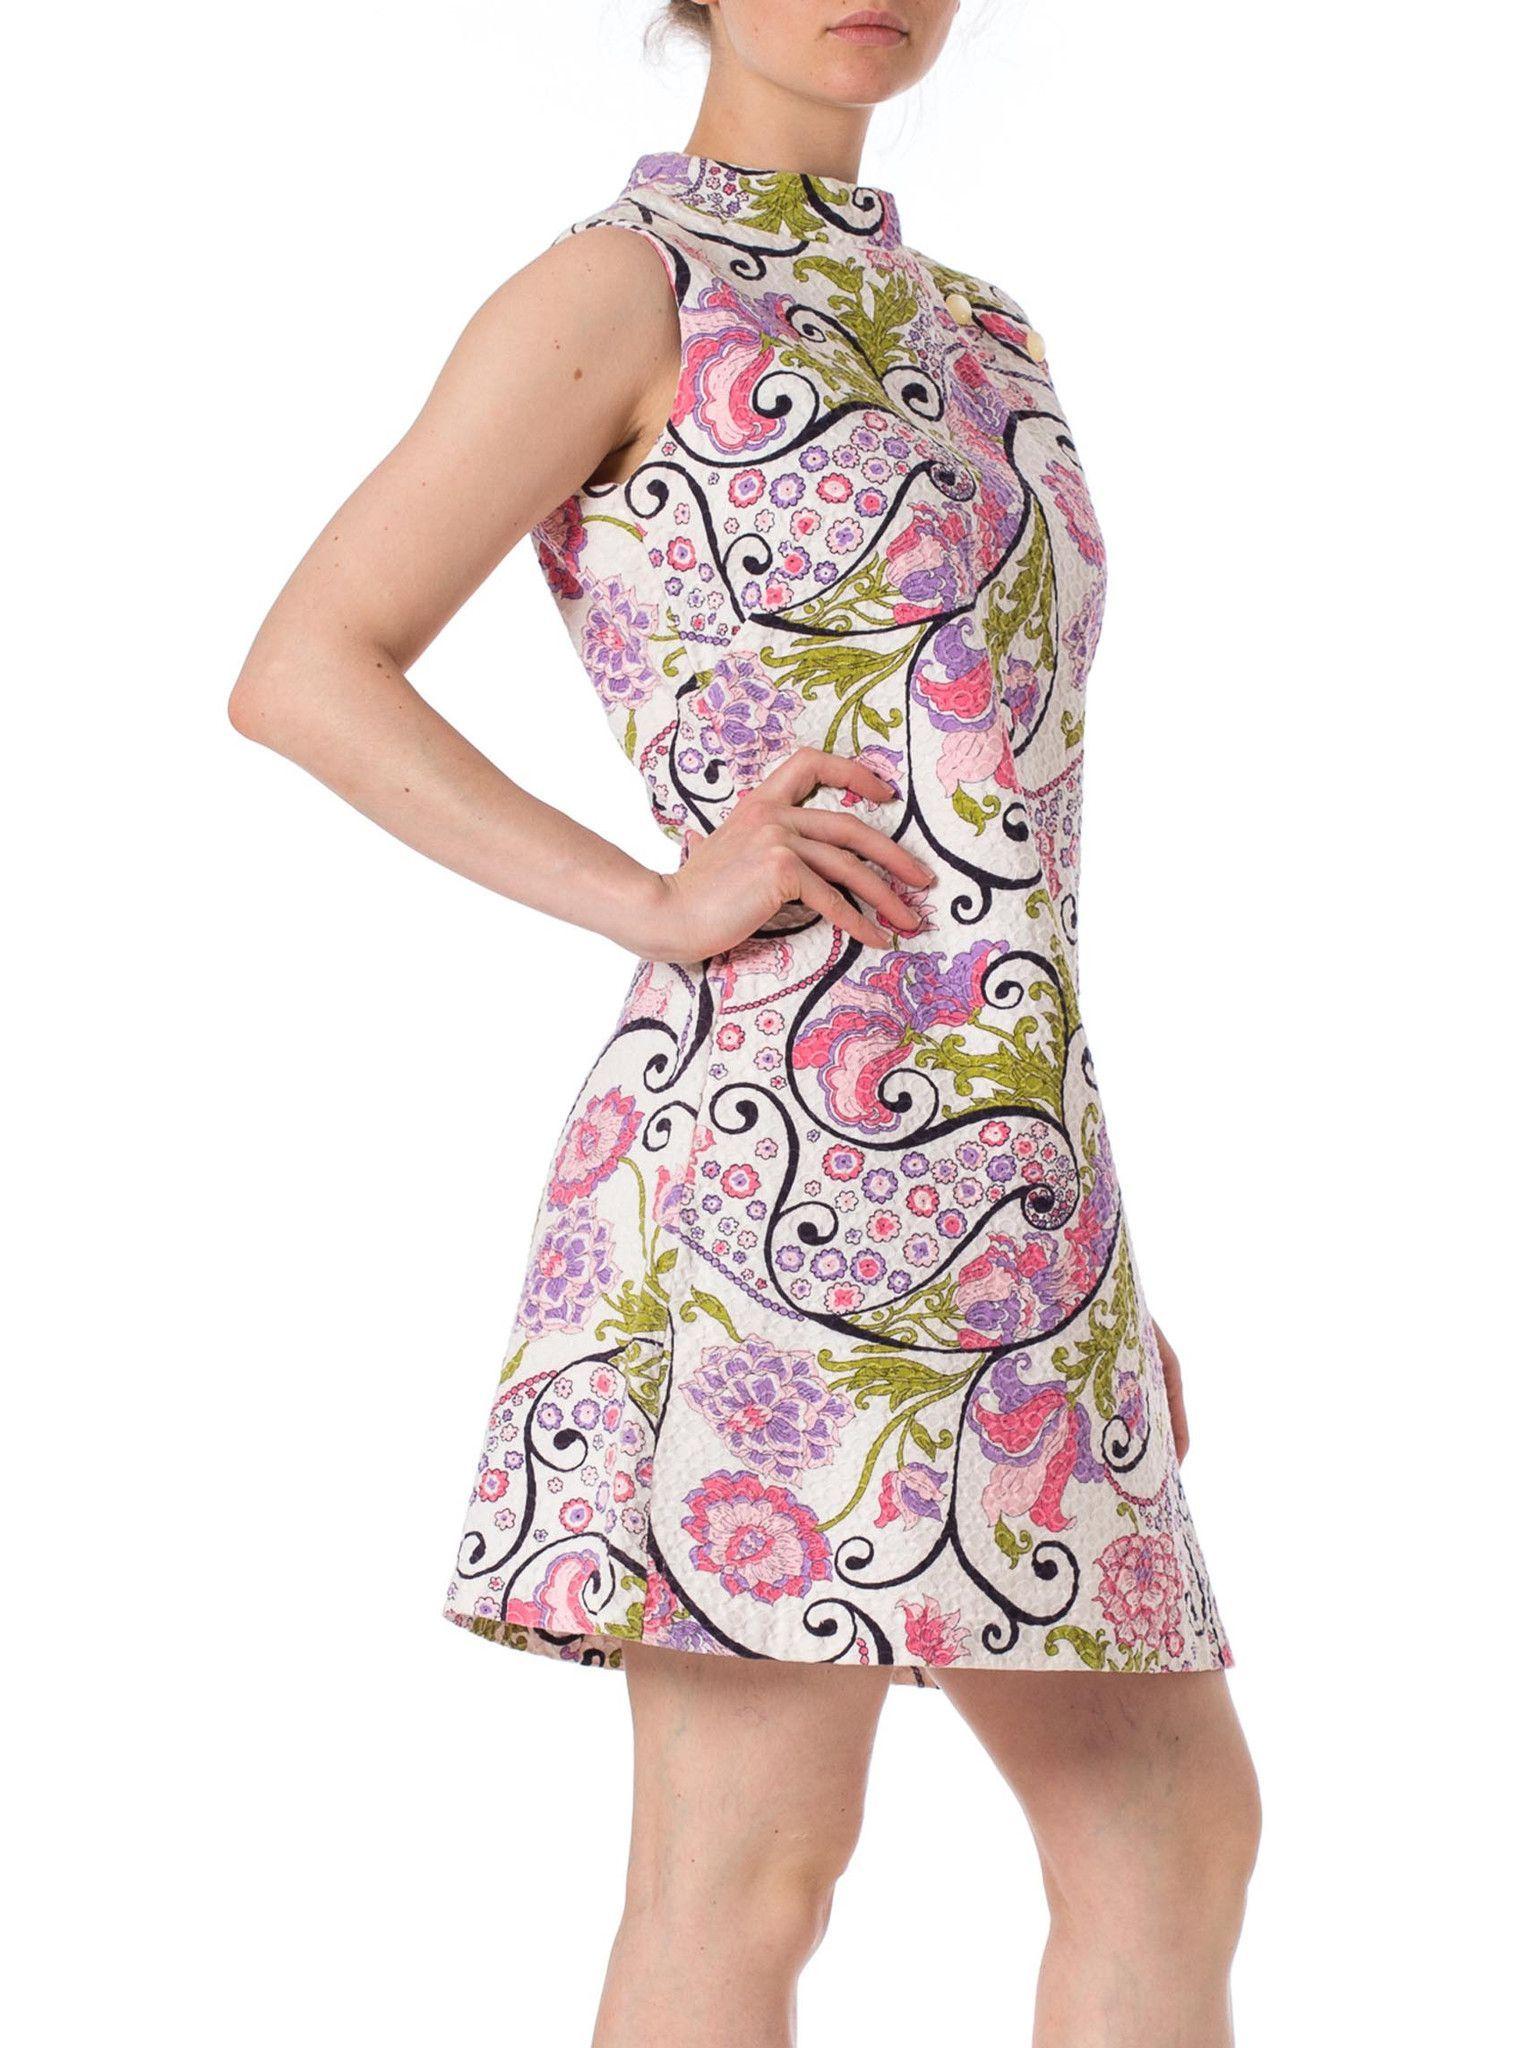 1960s MOD Floral Printed Cotton Sleeveless Dress